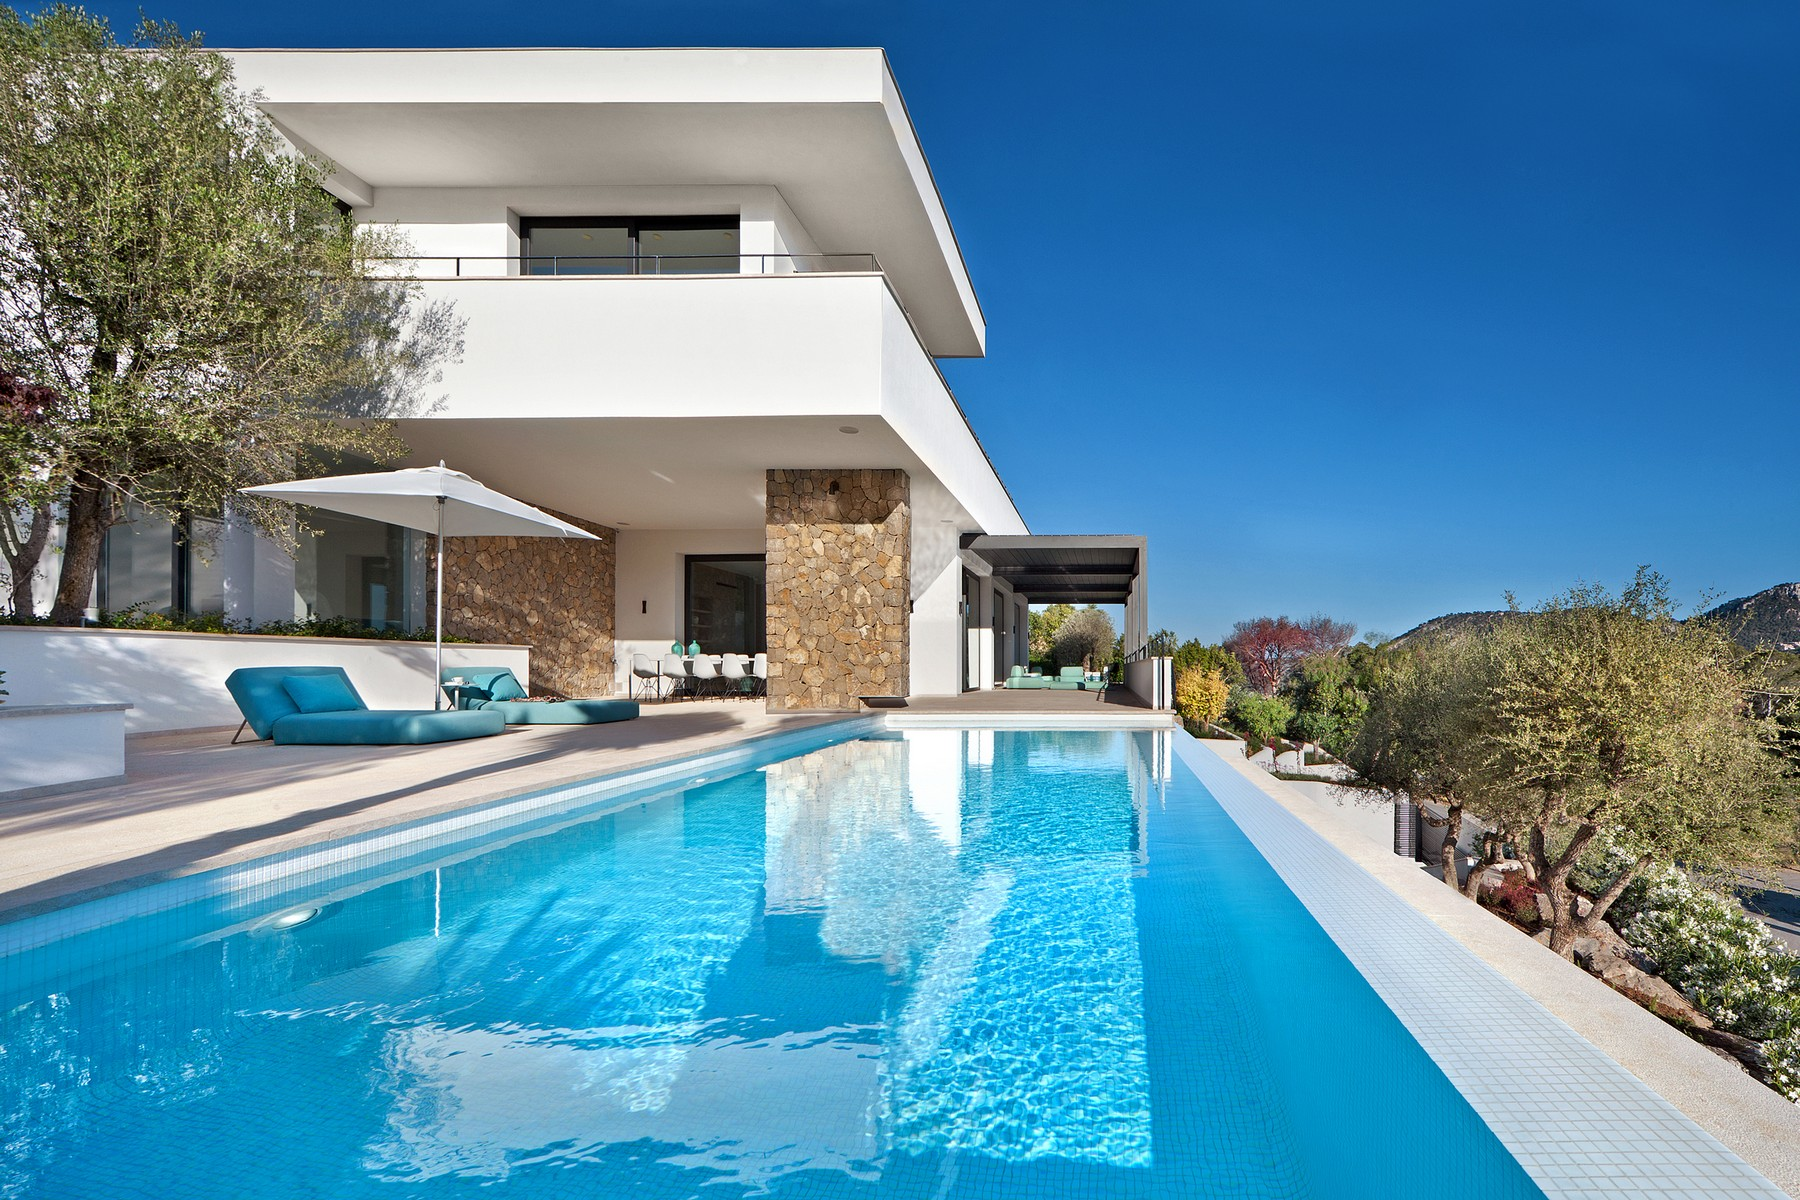 Casa Unifamiliar por un Venta en Elegant villa with fantastic views in Monport Port Andratx, Mallorca 07157 España